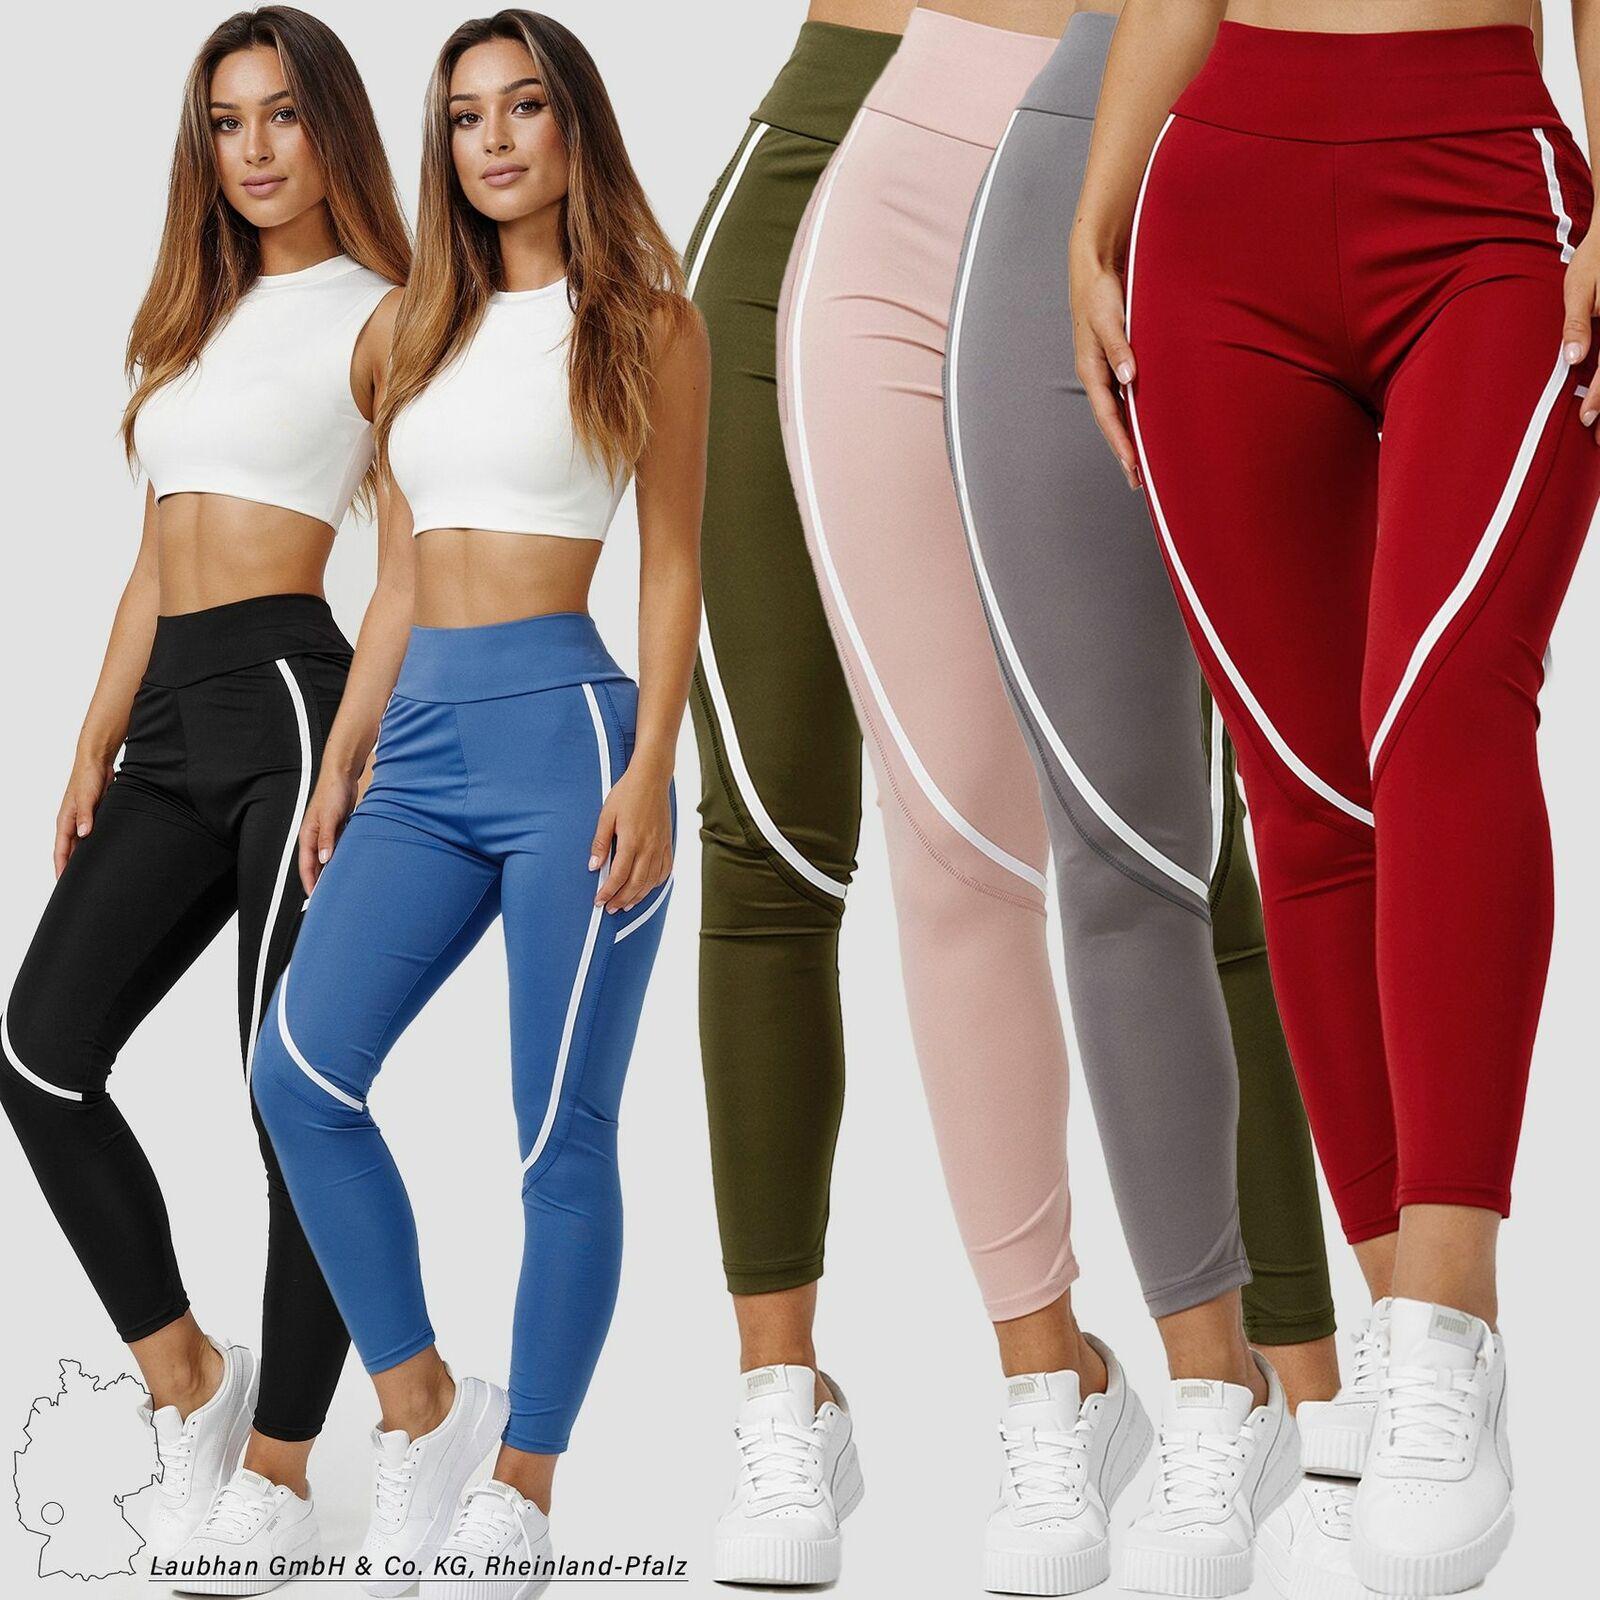 Damen Sport Leggings Stretch Fitness Hose Skinny Yoga Pants Treggings mit Tasche